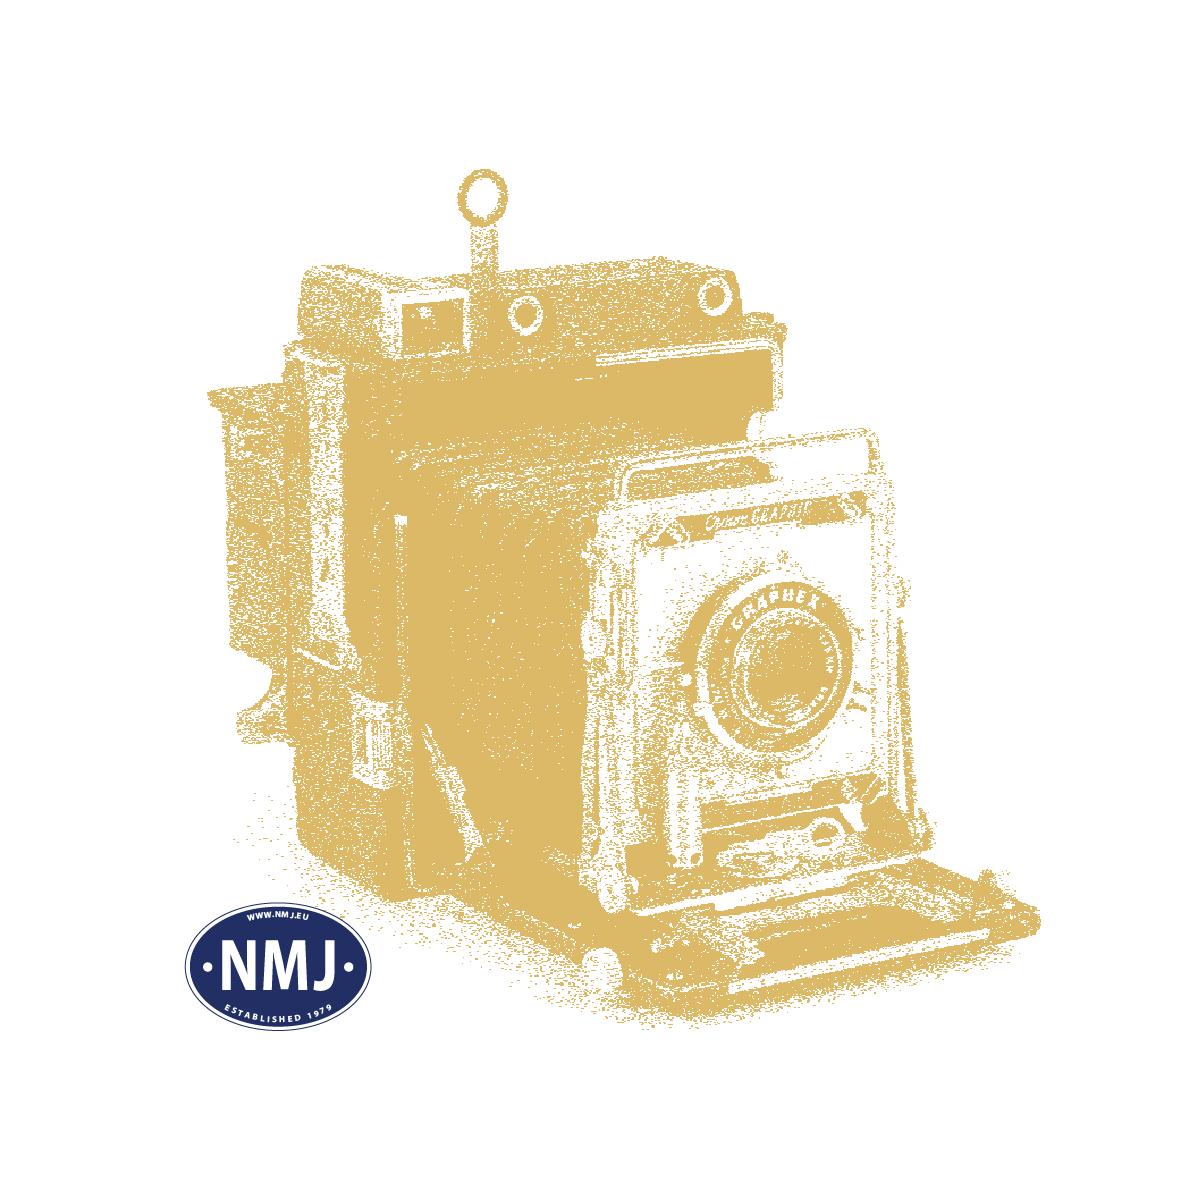 "NMJT609.301 - NMJ Topline SJ Gre 53082 ""Gullfiber"""